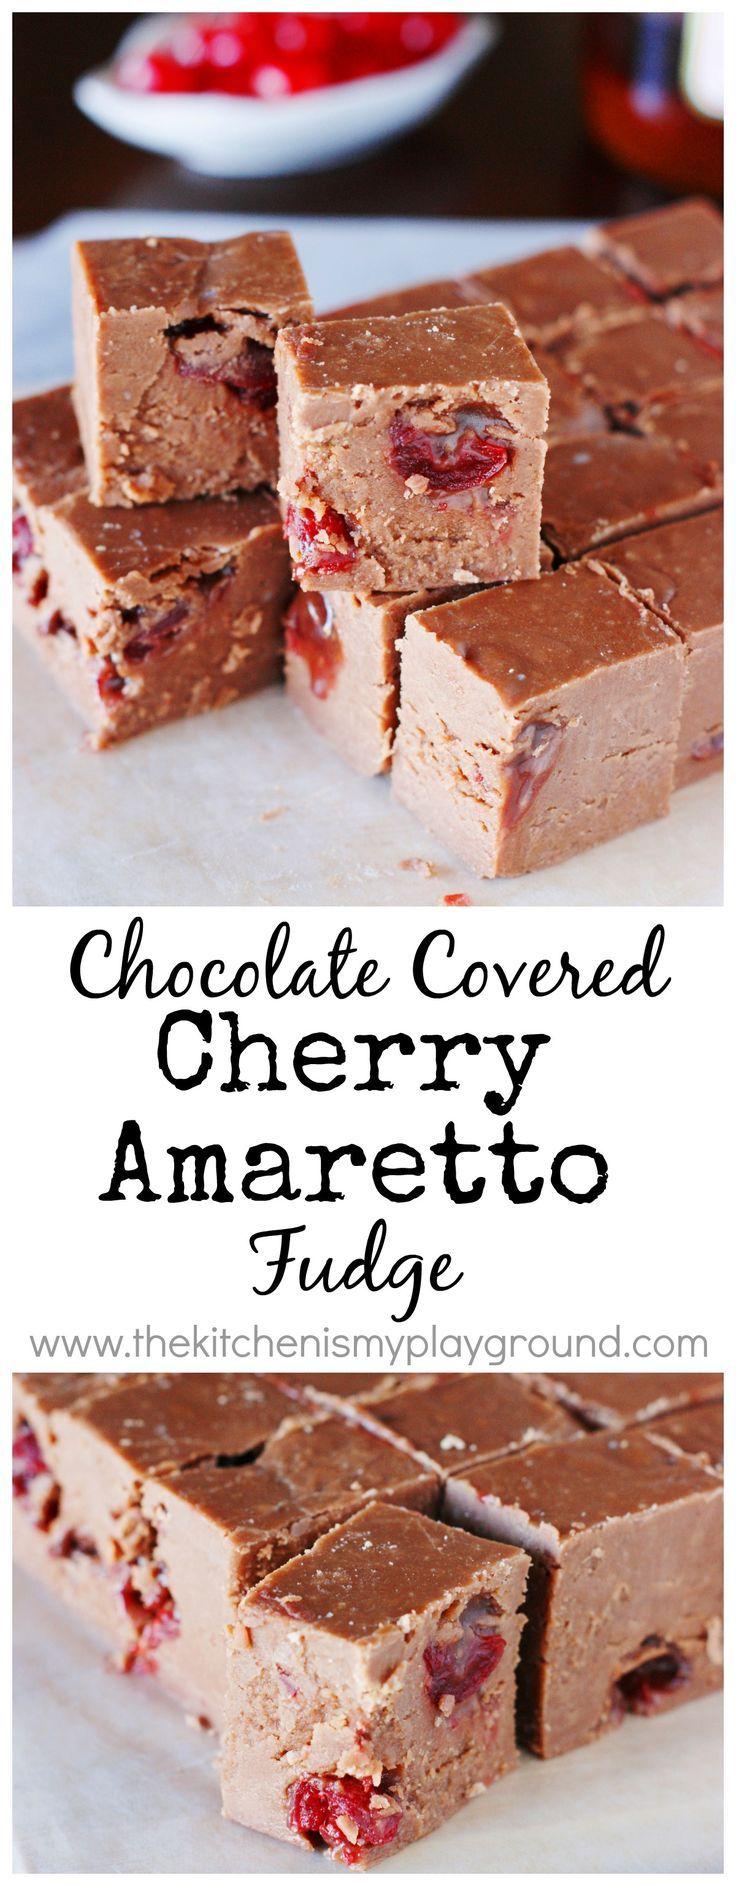 Chocolate Covered Cherry Amaretto Fudge ~ the wonderful flavors of chocolate, maraschino cherries, and Amaretto liqueur combine in this rich and delicious fudge. www.thekitchenismyplayground.com